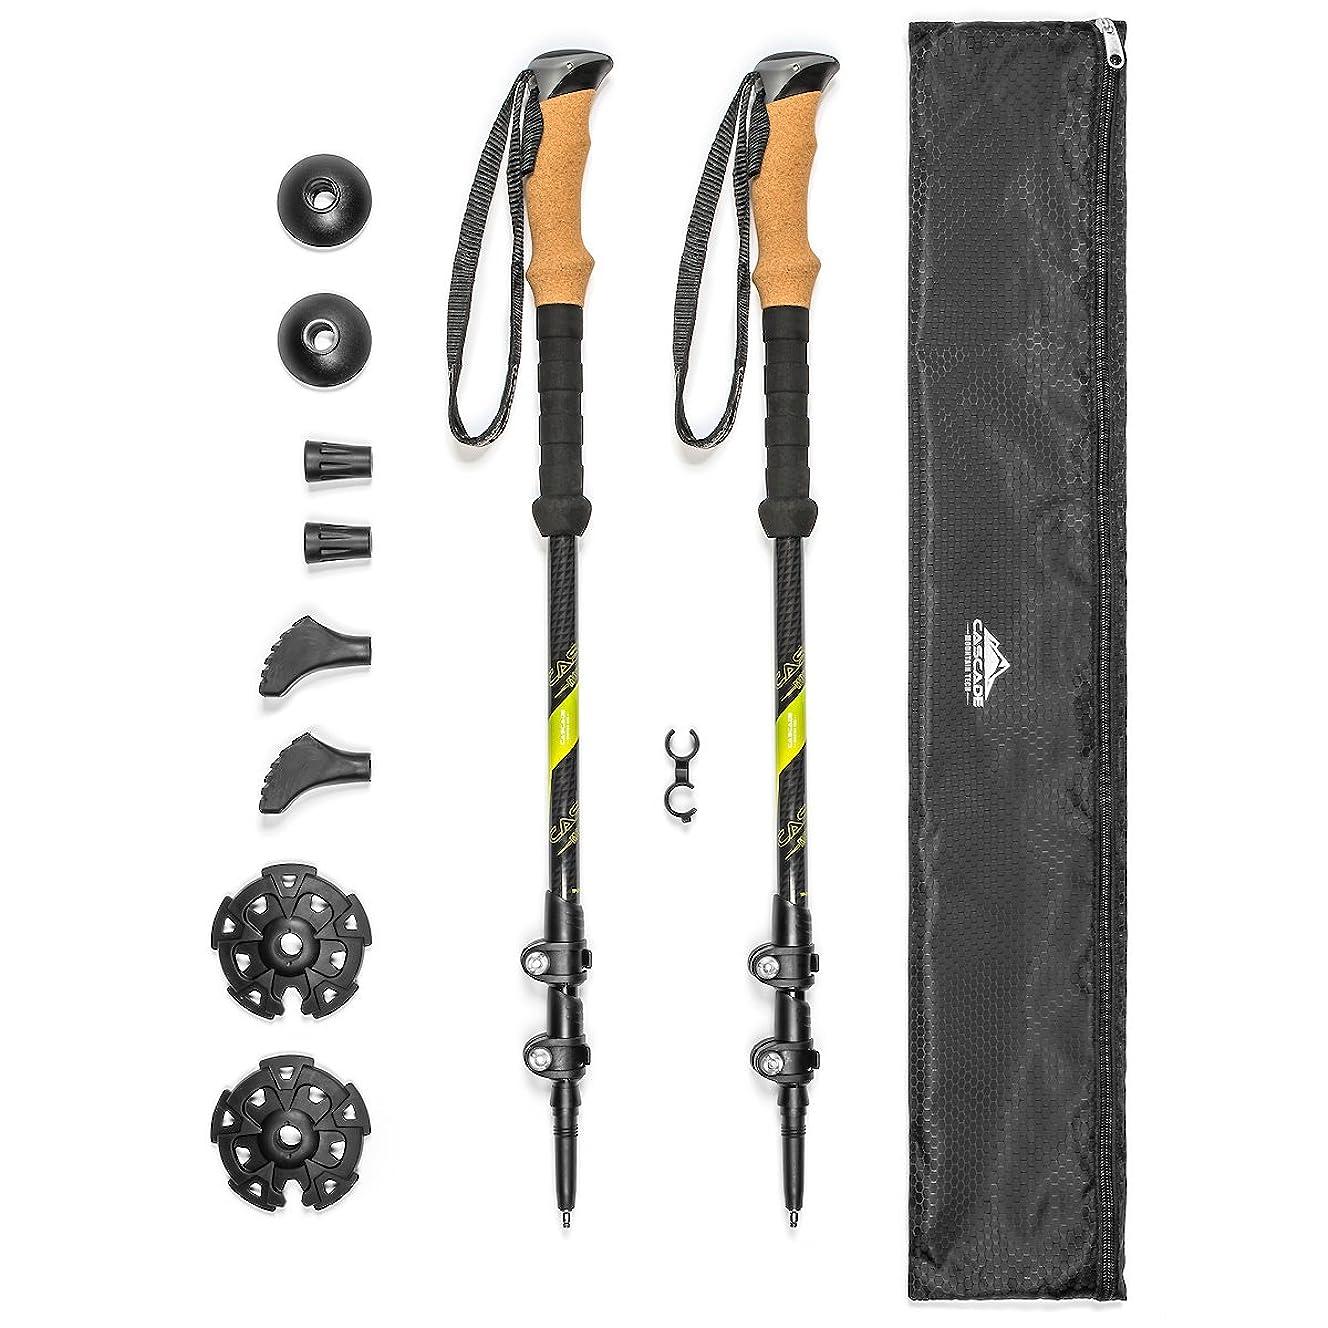 Cascade Mountain Tech Carbon Fiber Quick Lock Trekking Poles - Collapsible Walking or Hiking Stick